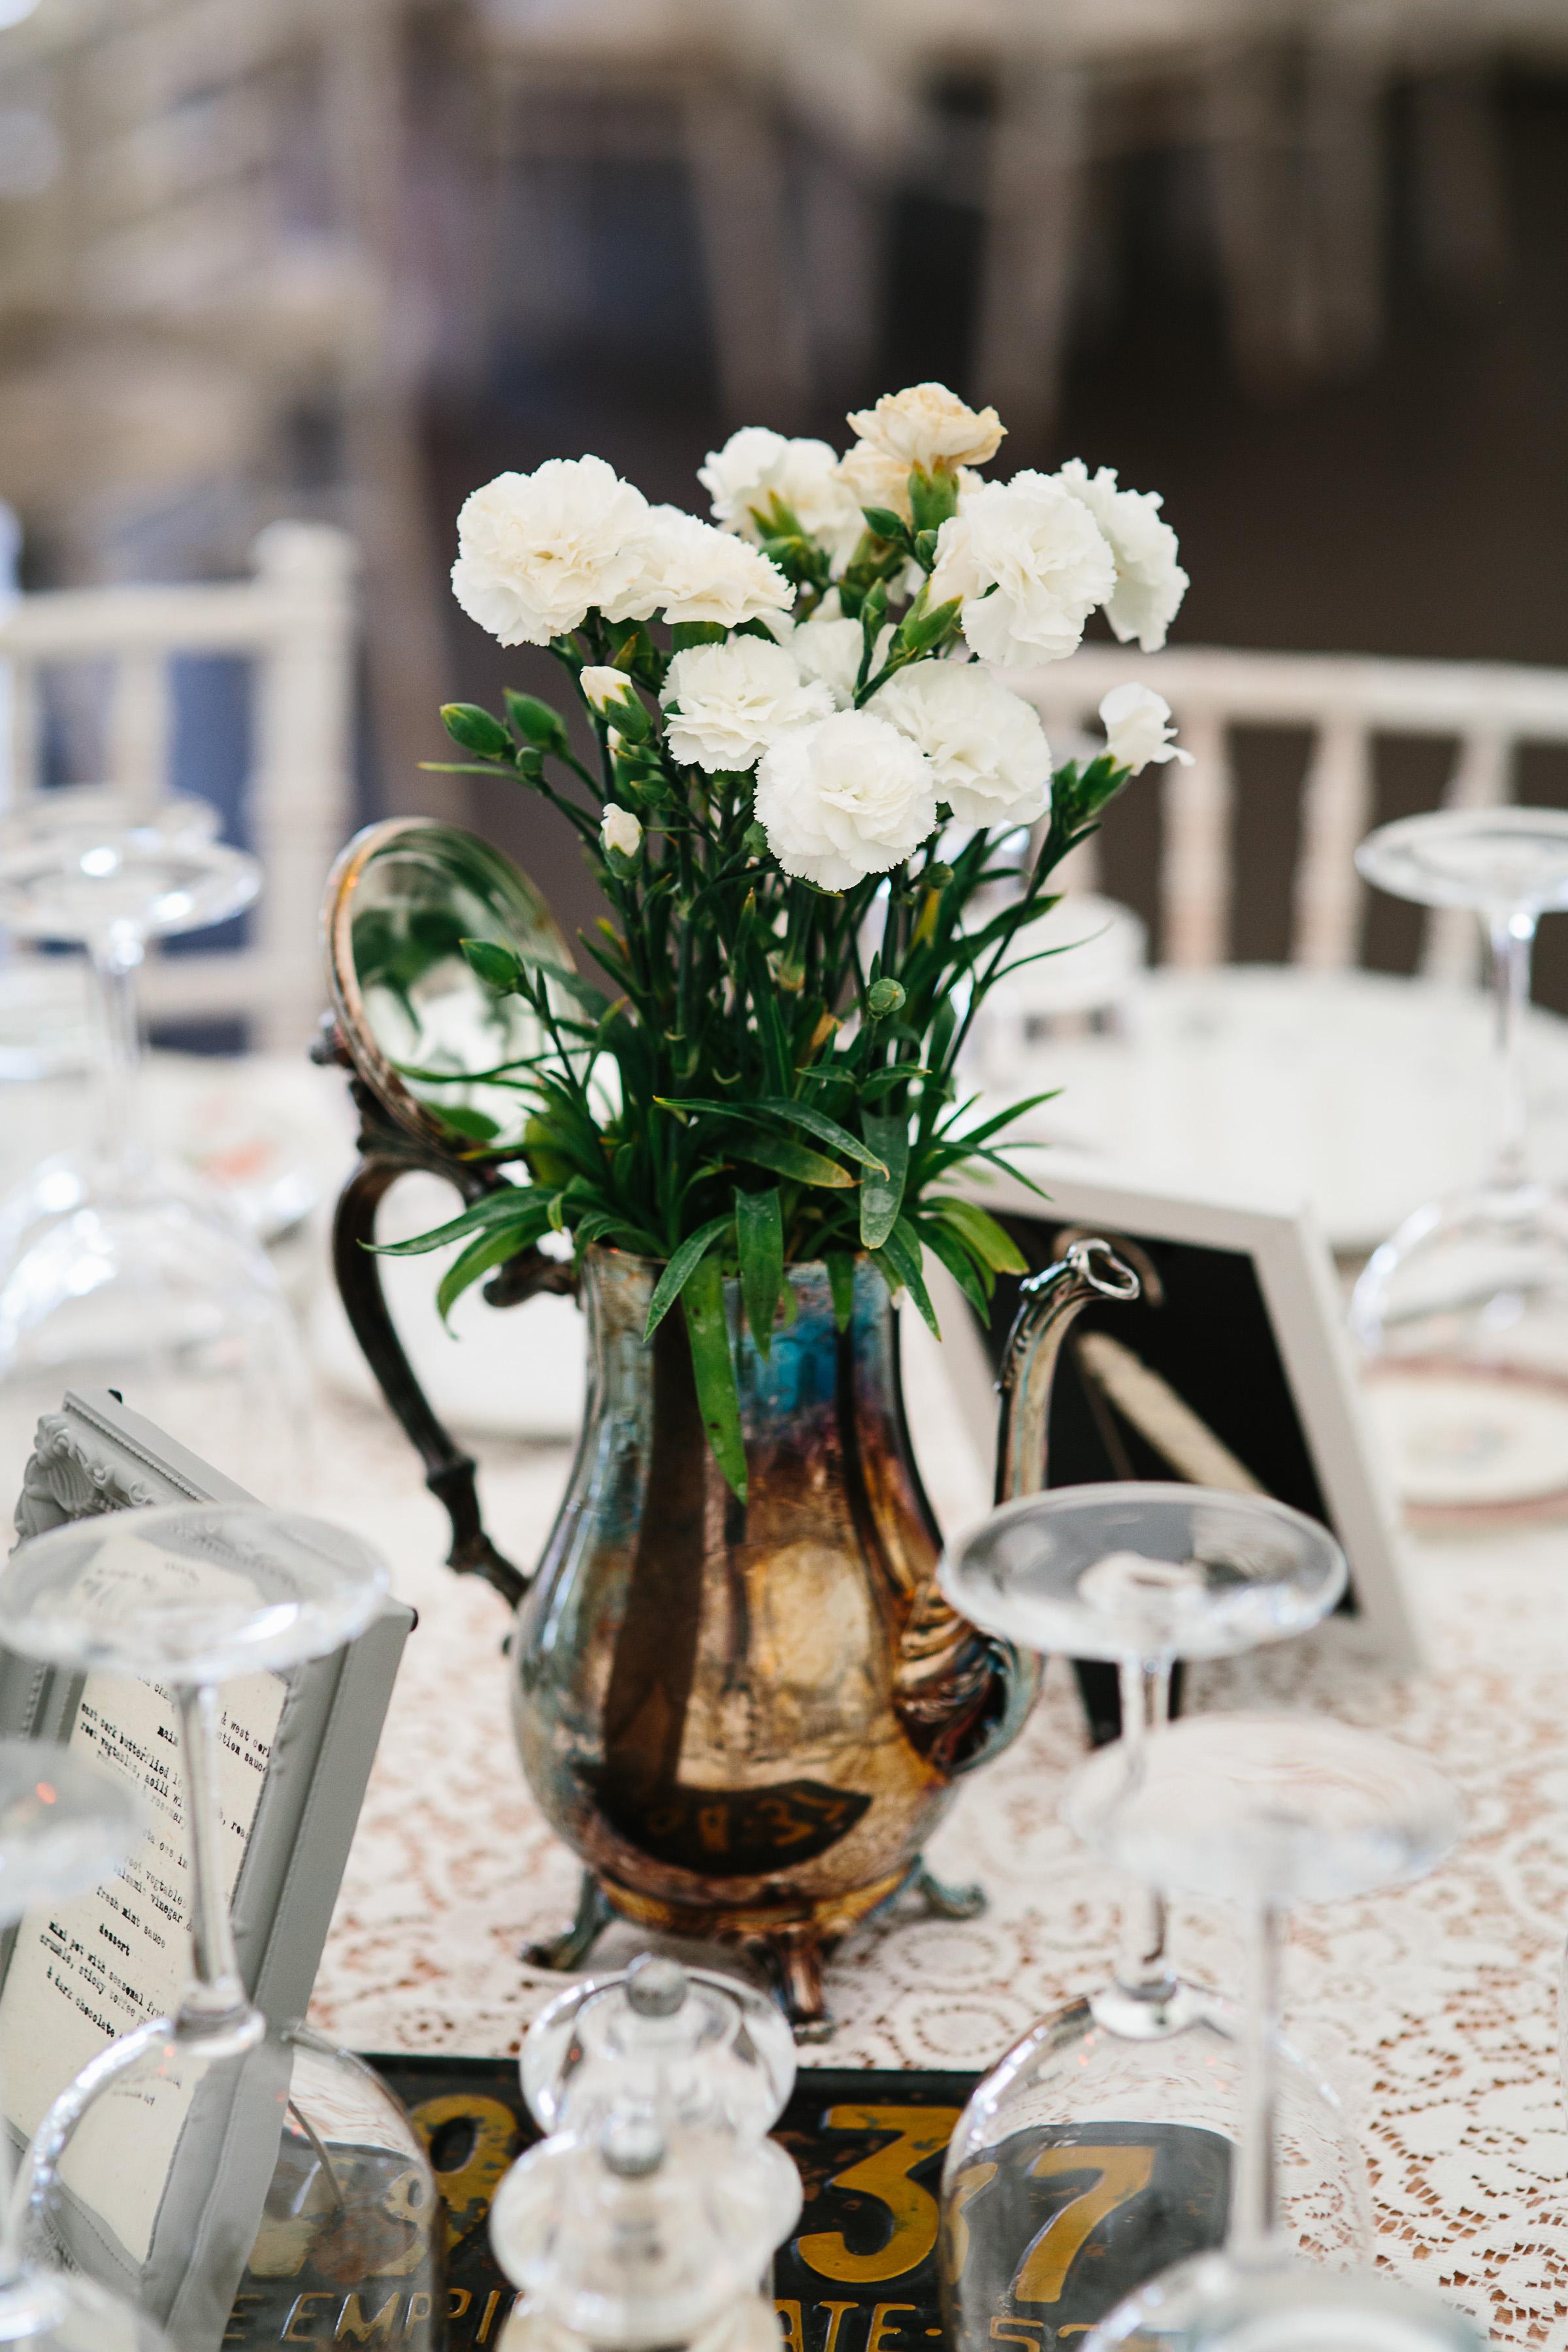 Floral Decoration French Vintage Coffee Pot Flower Vase Wedding Decoration French Vintage French Antique Teapot old Table Decoration